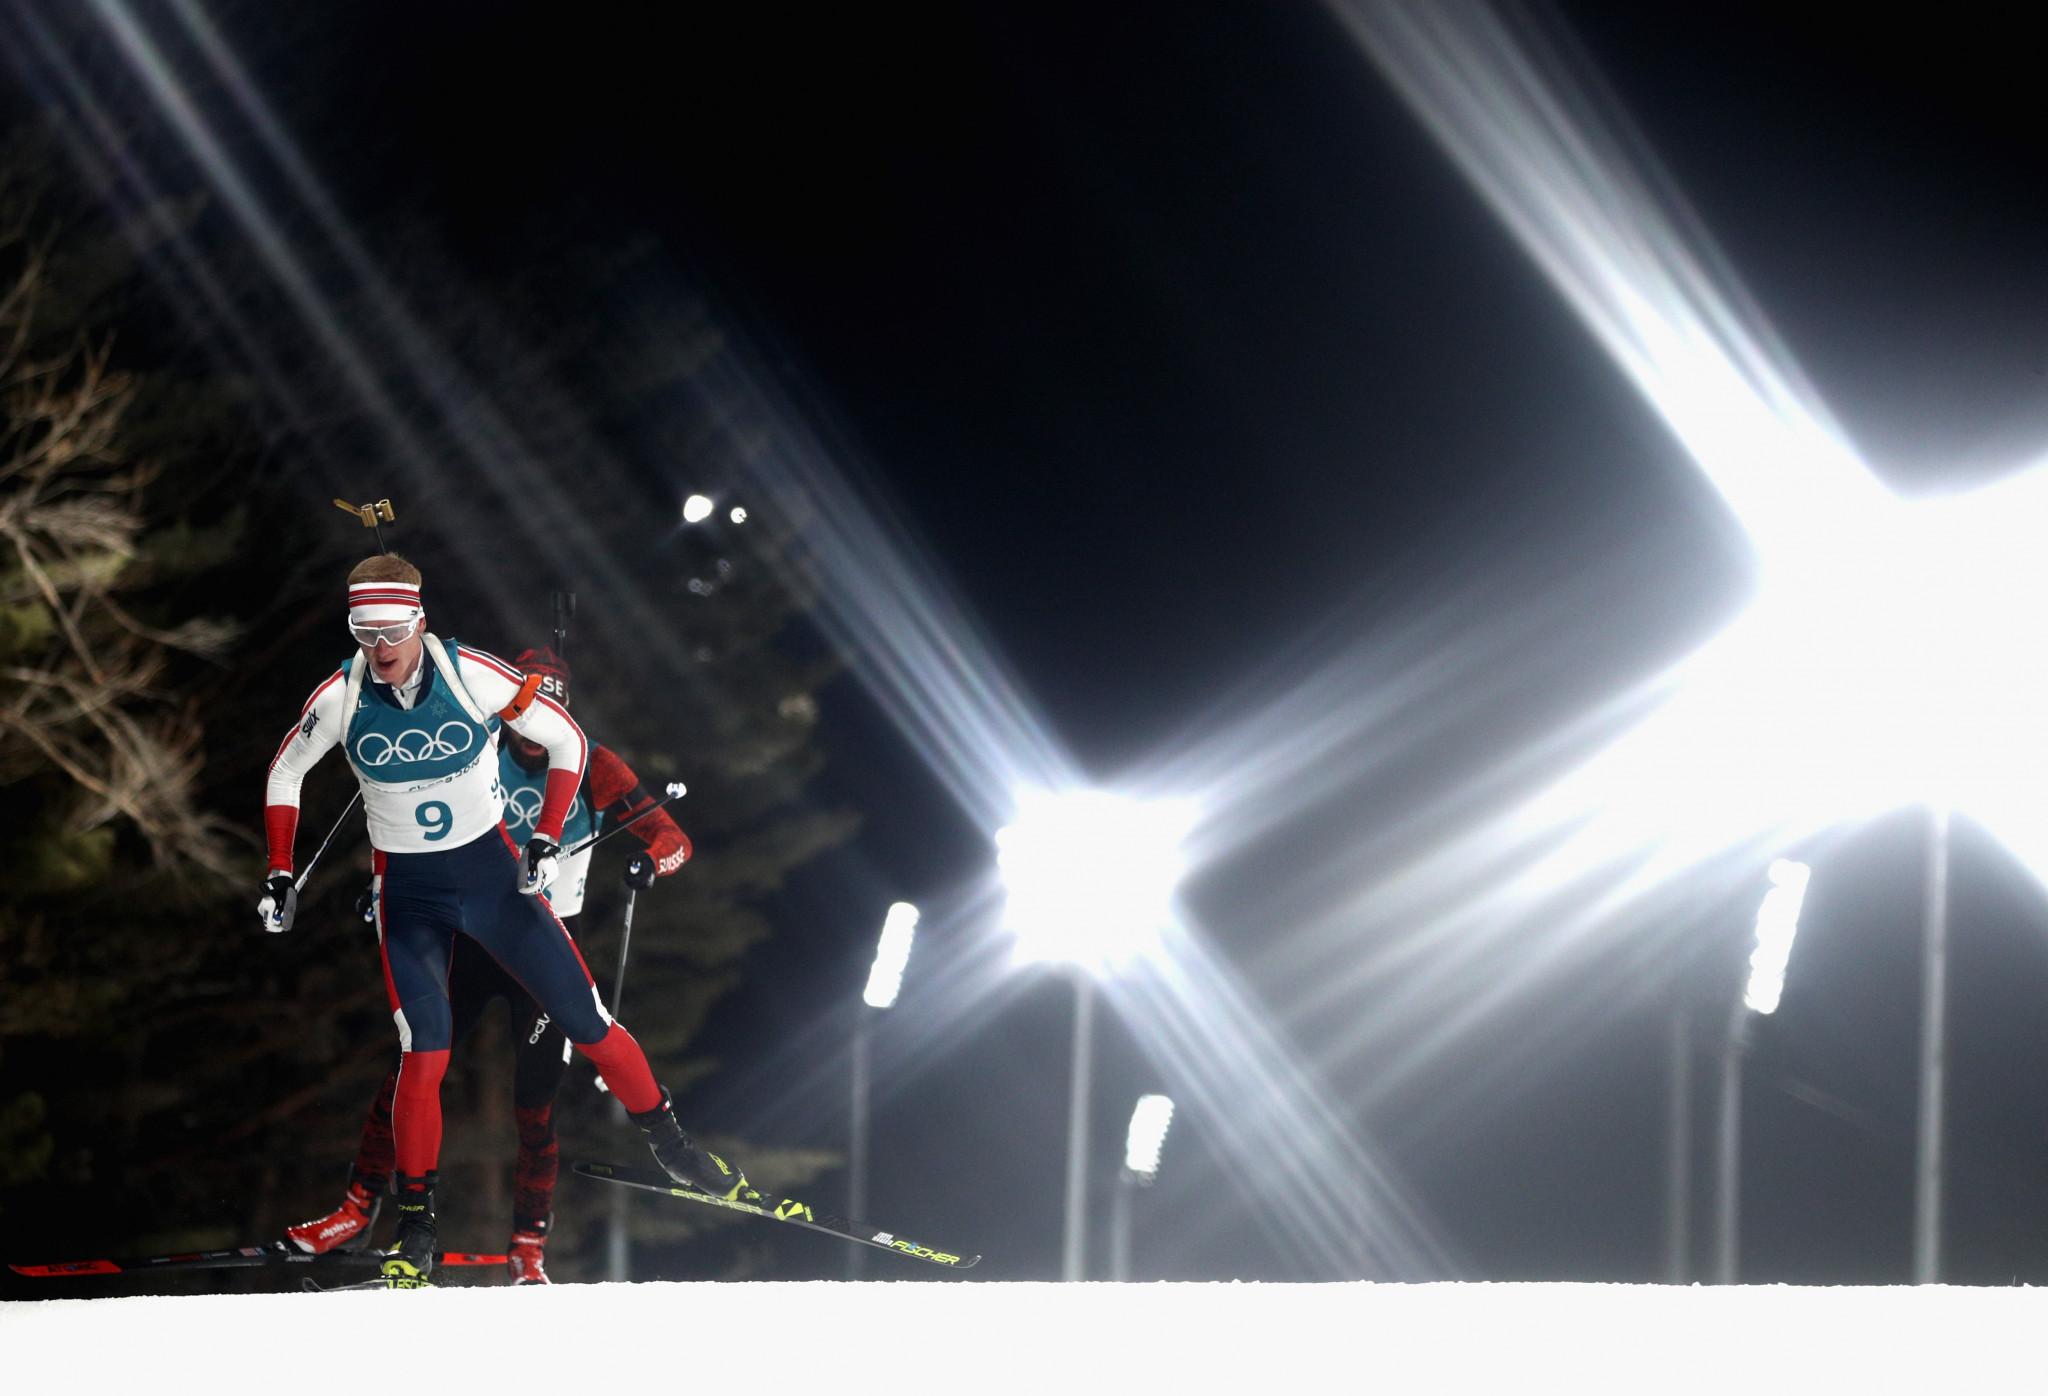 Bø and Oberg claim contrasting individual biathlon victories at Pyeongchang 2018